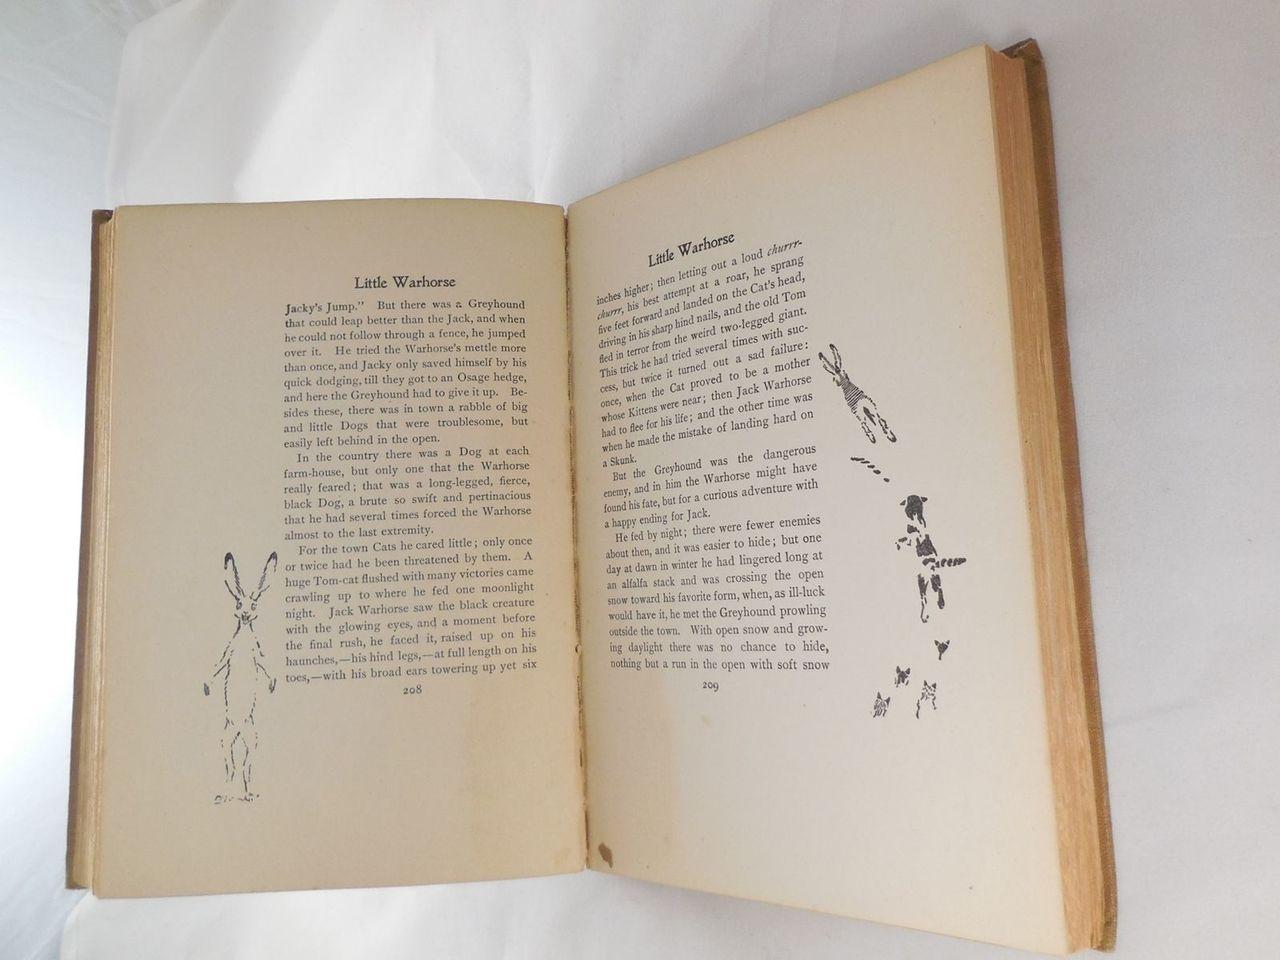 ANIMAL HEROES, by Ernest Thompson Seton - 1905 [Signed 1st Ed]